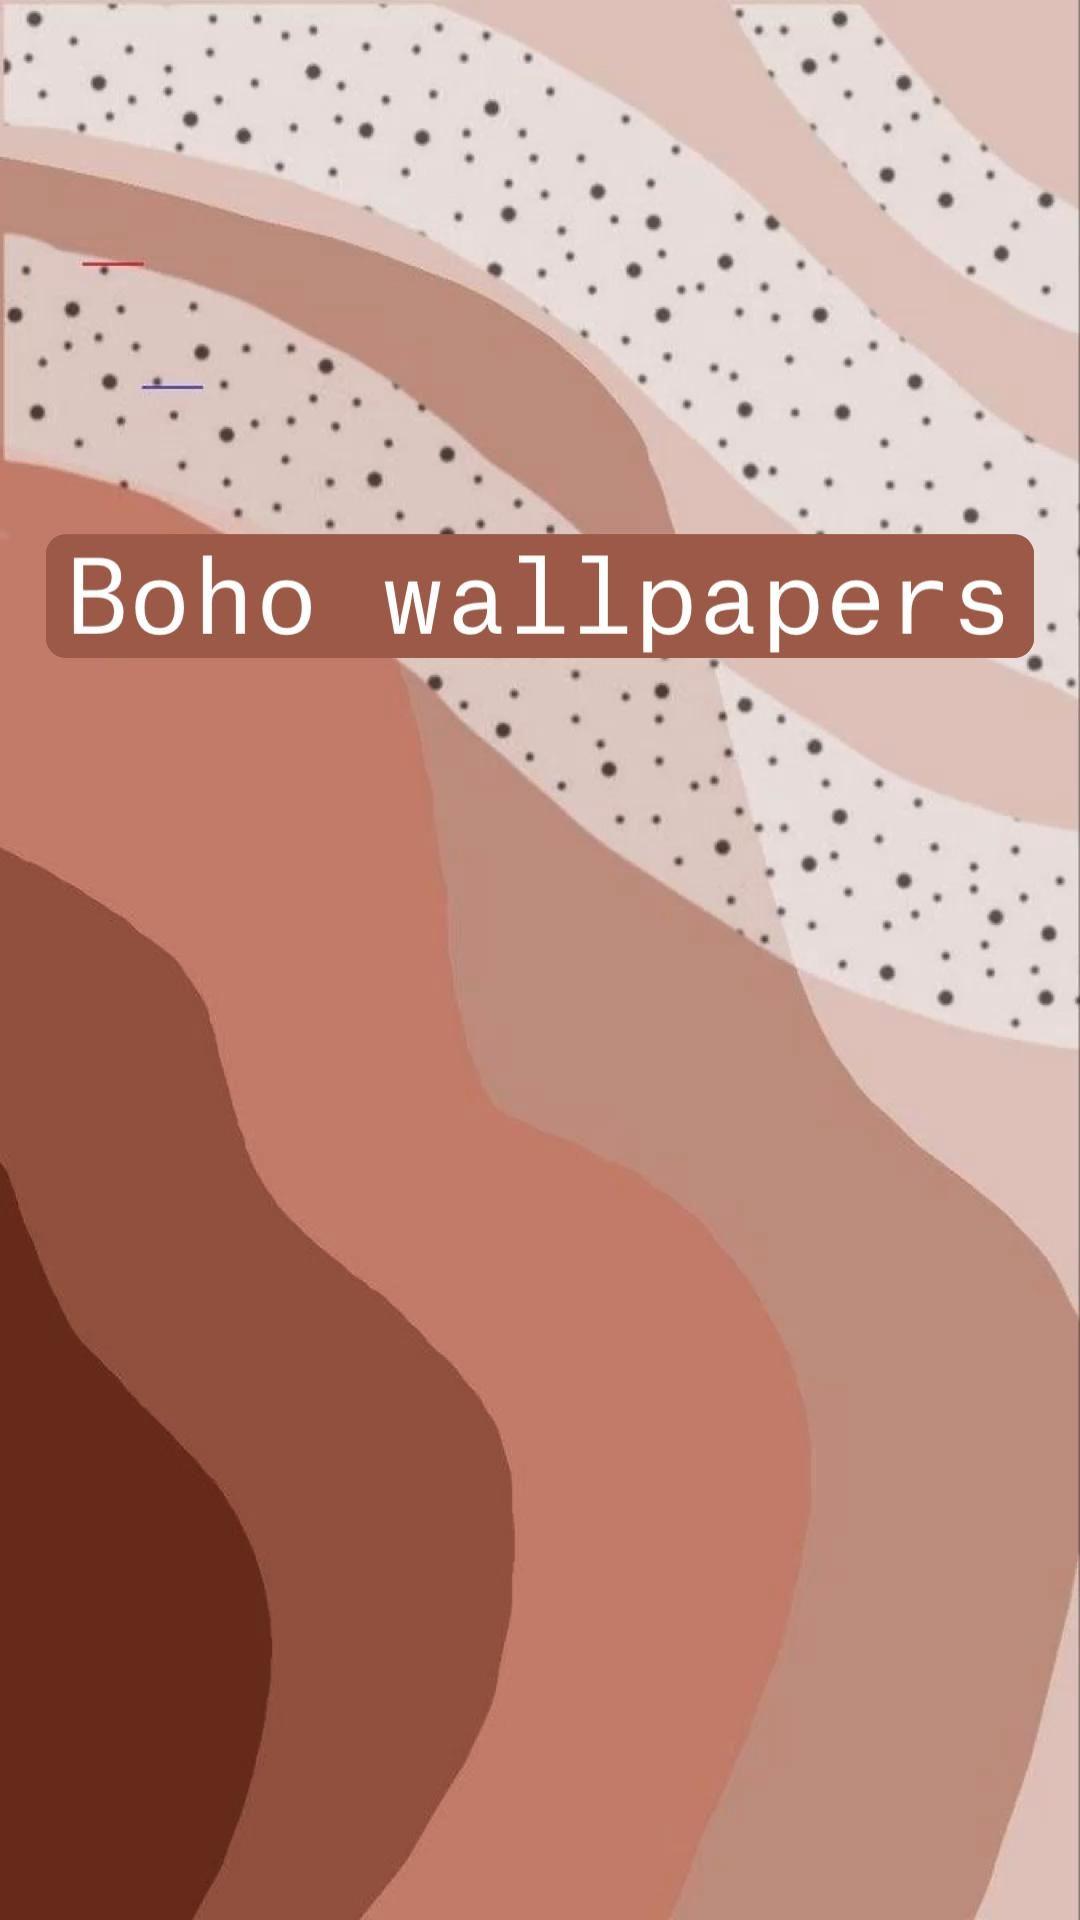 Boho wallpapers